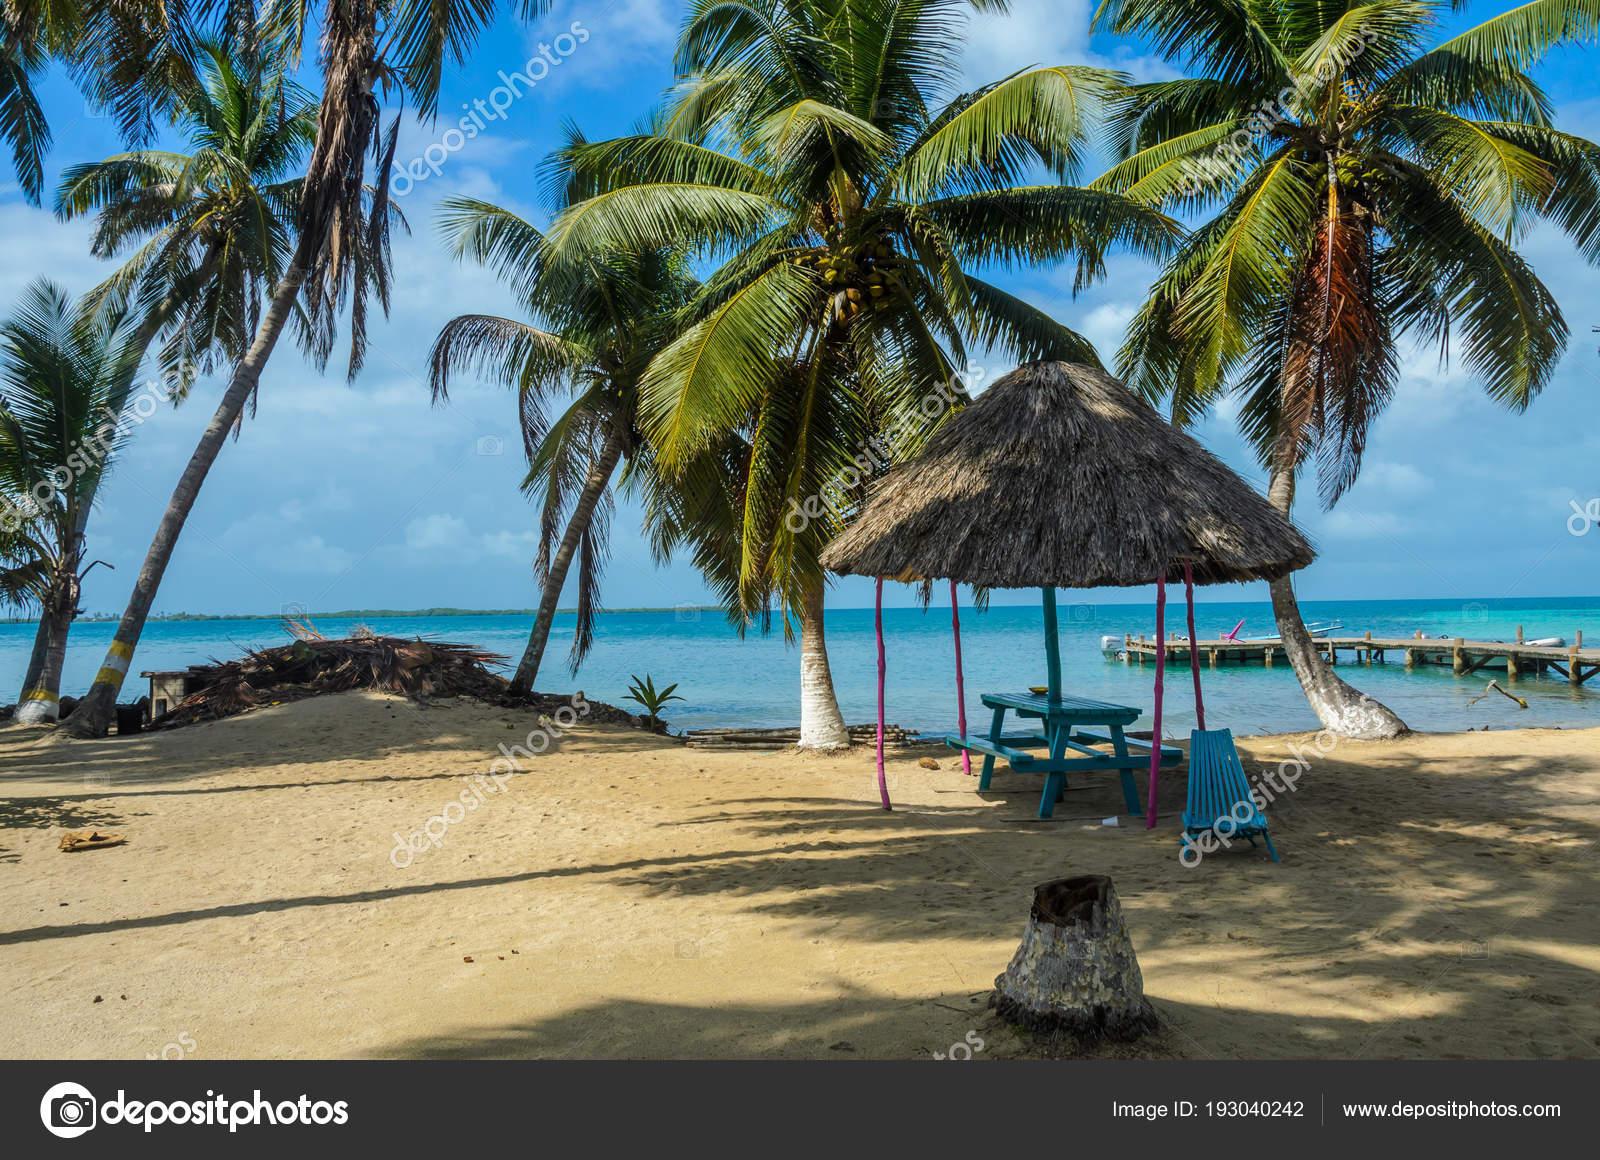 Tobacco Caye Small Tropical Island Barrier Reef Paradise Beach Caribbean Stock Photo Image By C Simondannhauer 193040242